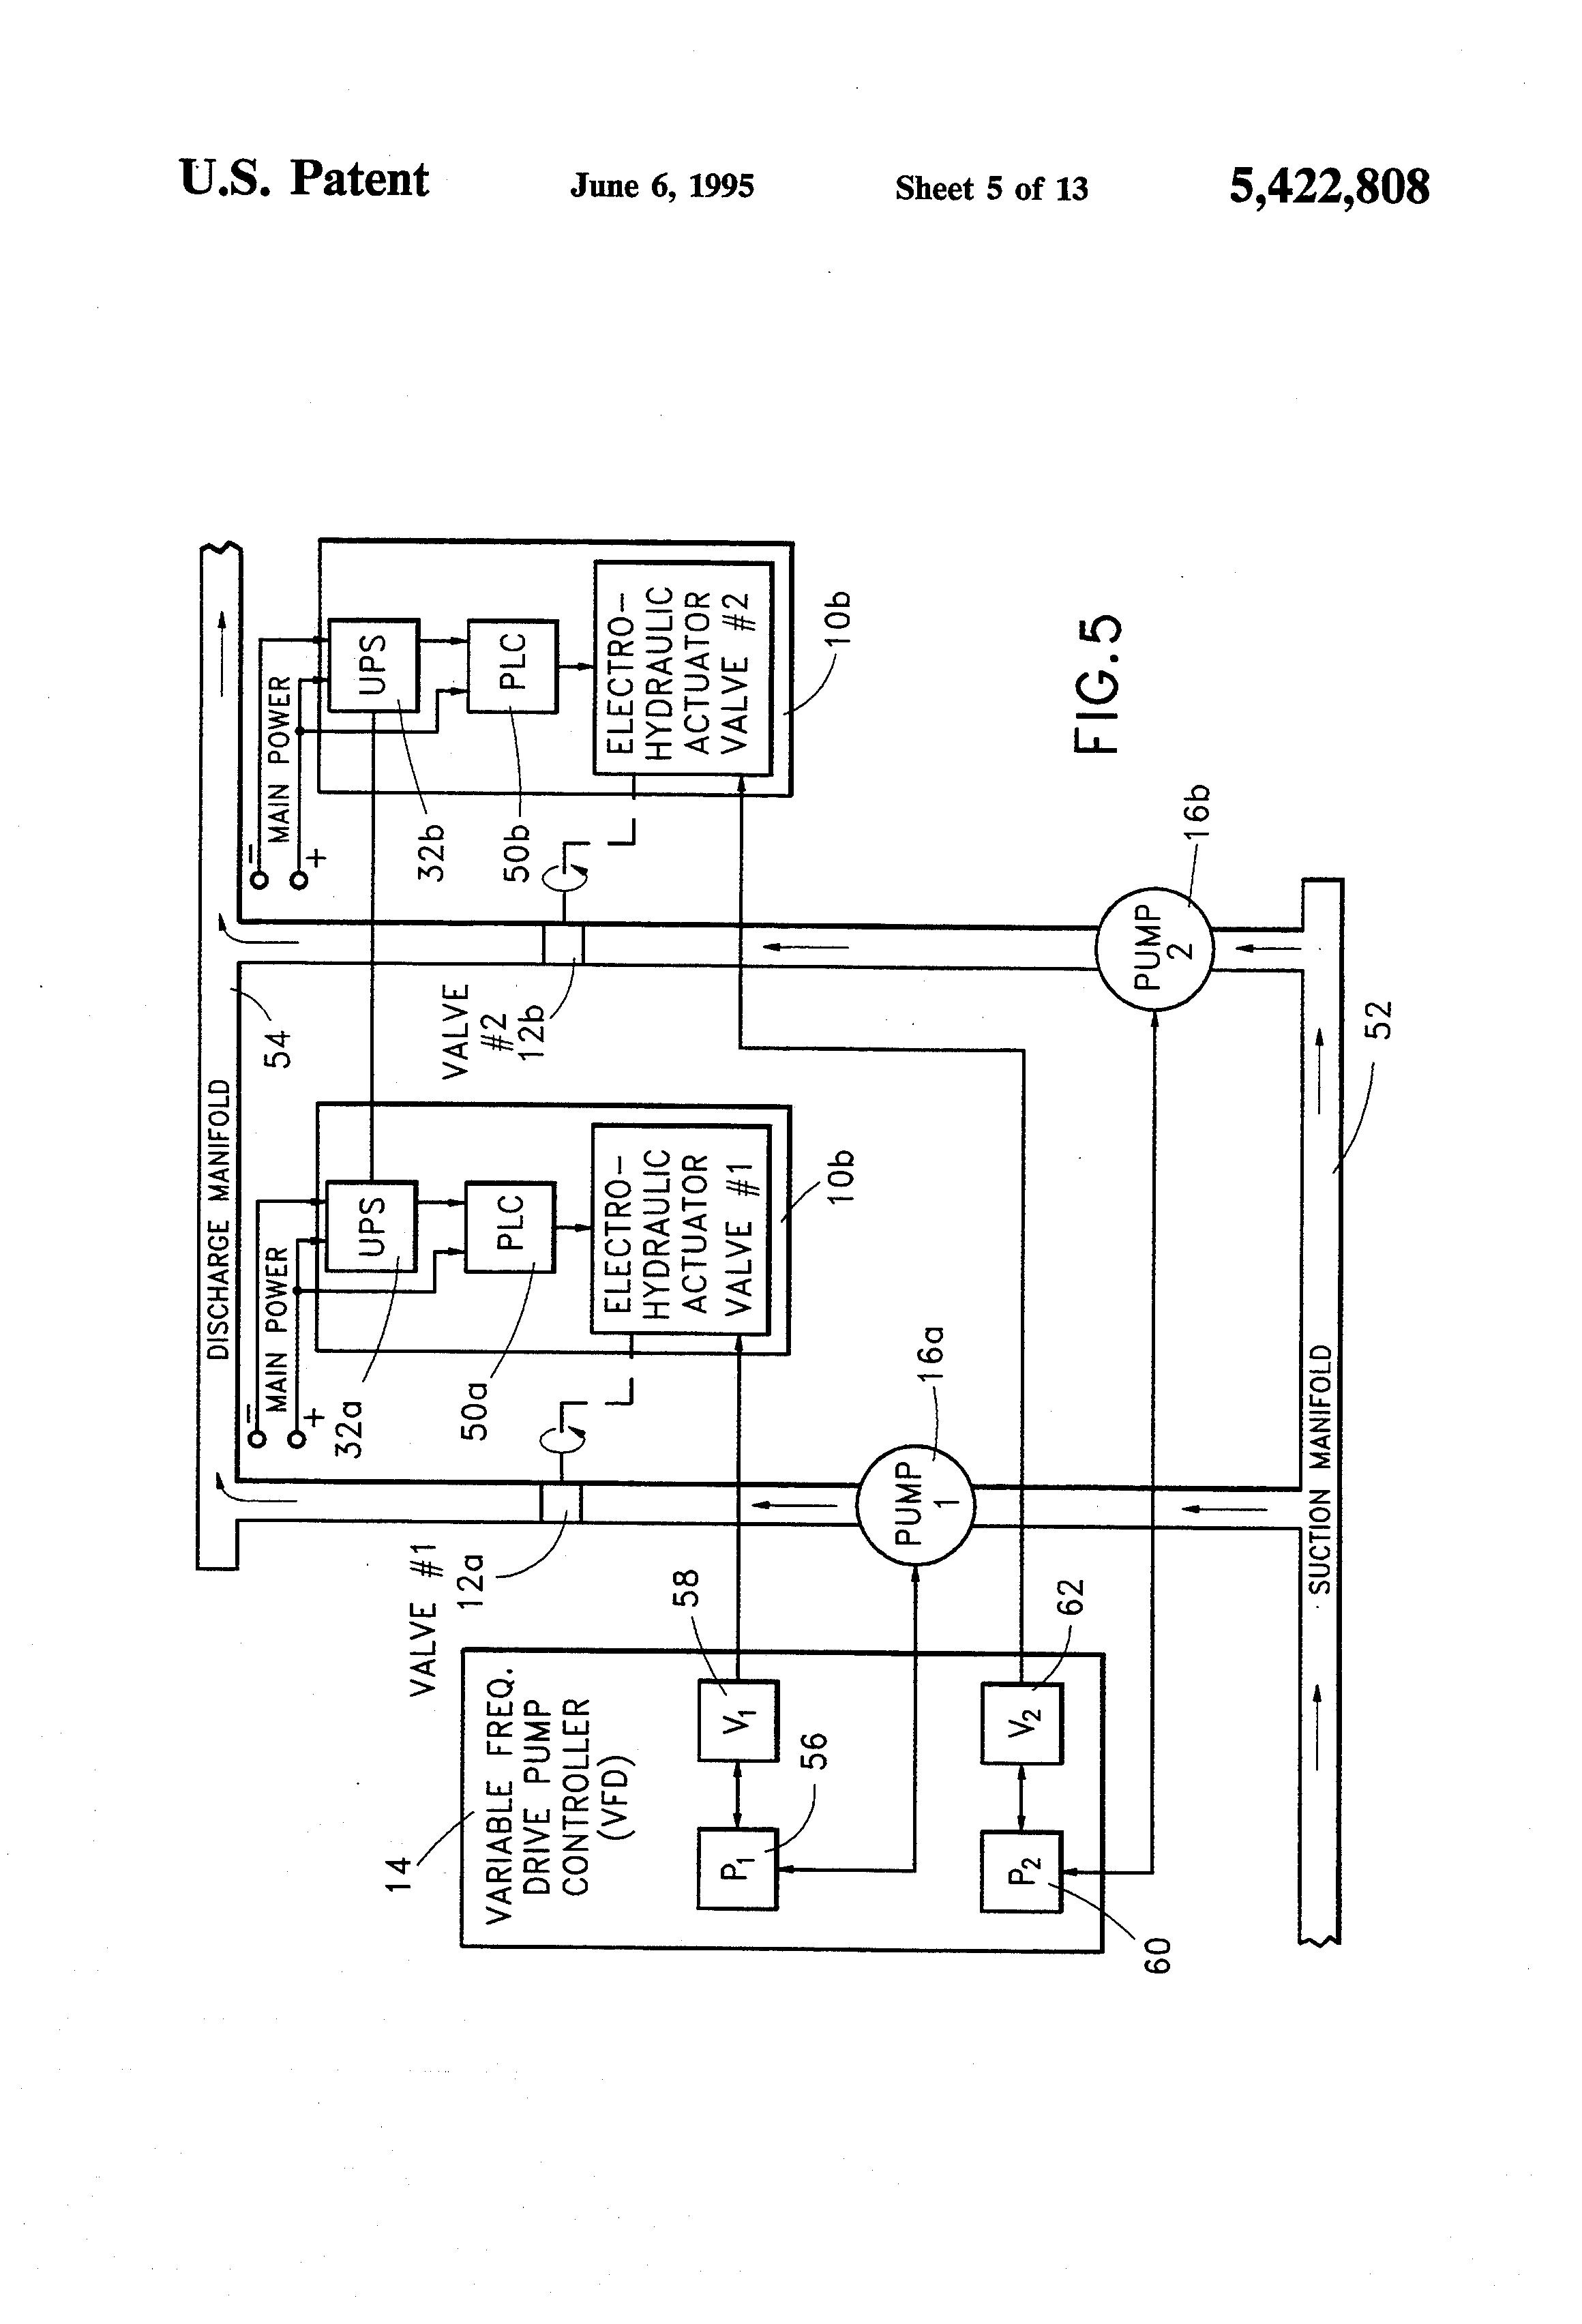 Rotork Wiring Diagram 2240 Auto Electrical Wiring Diagram